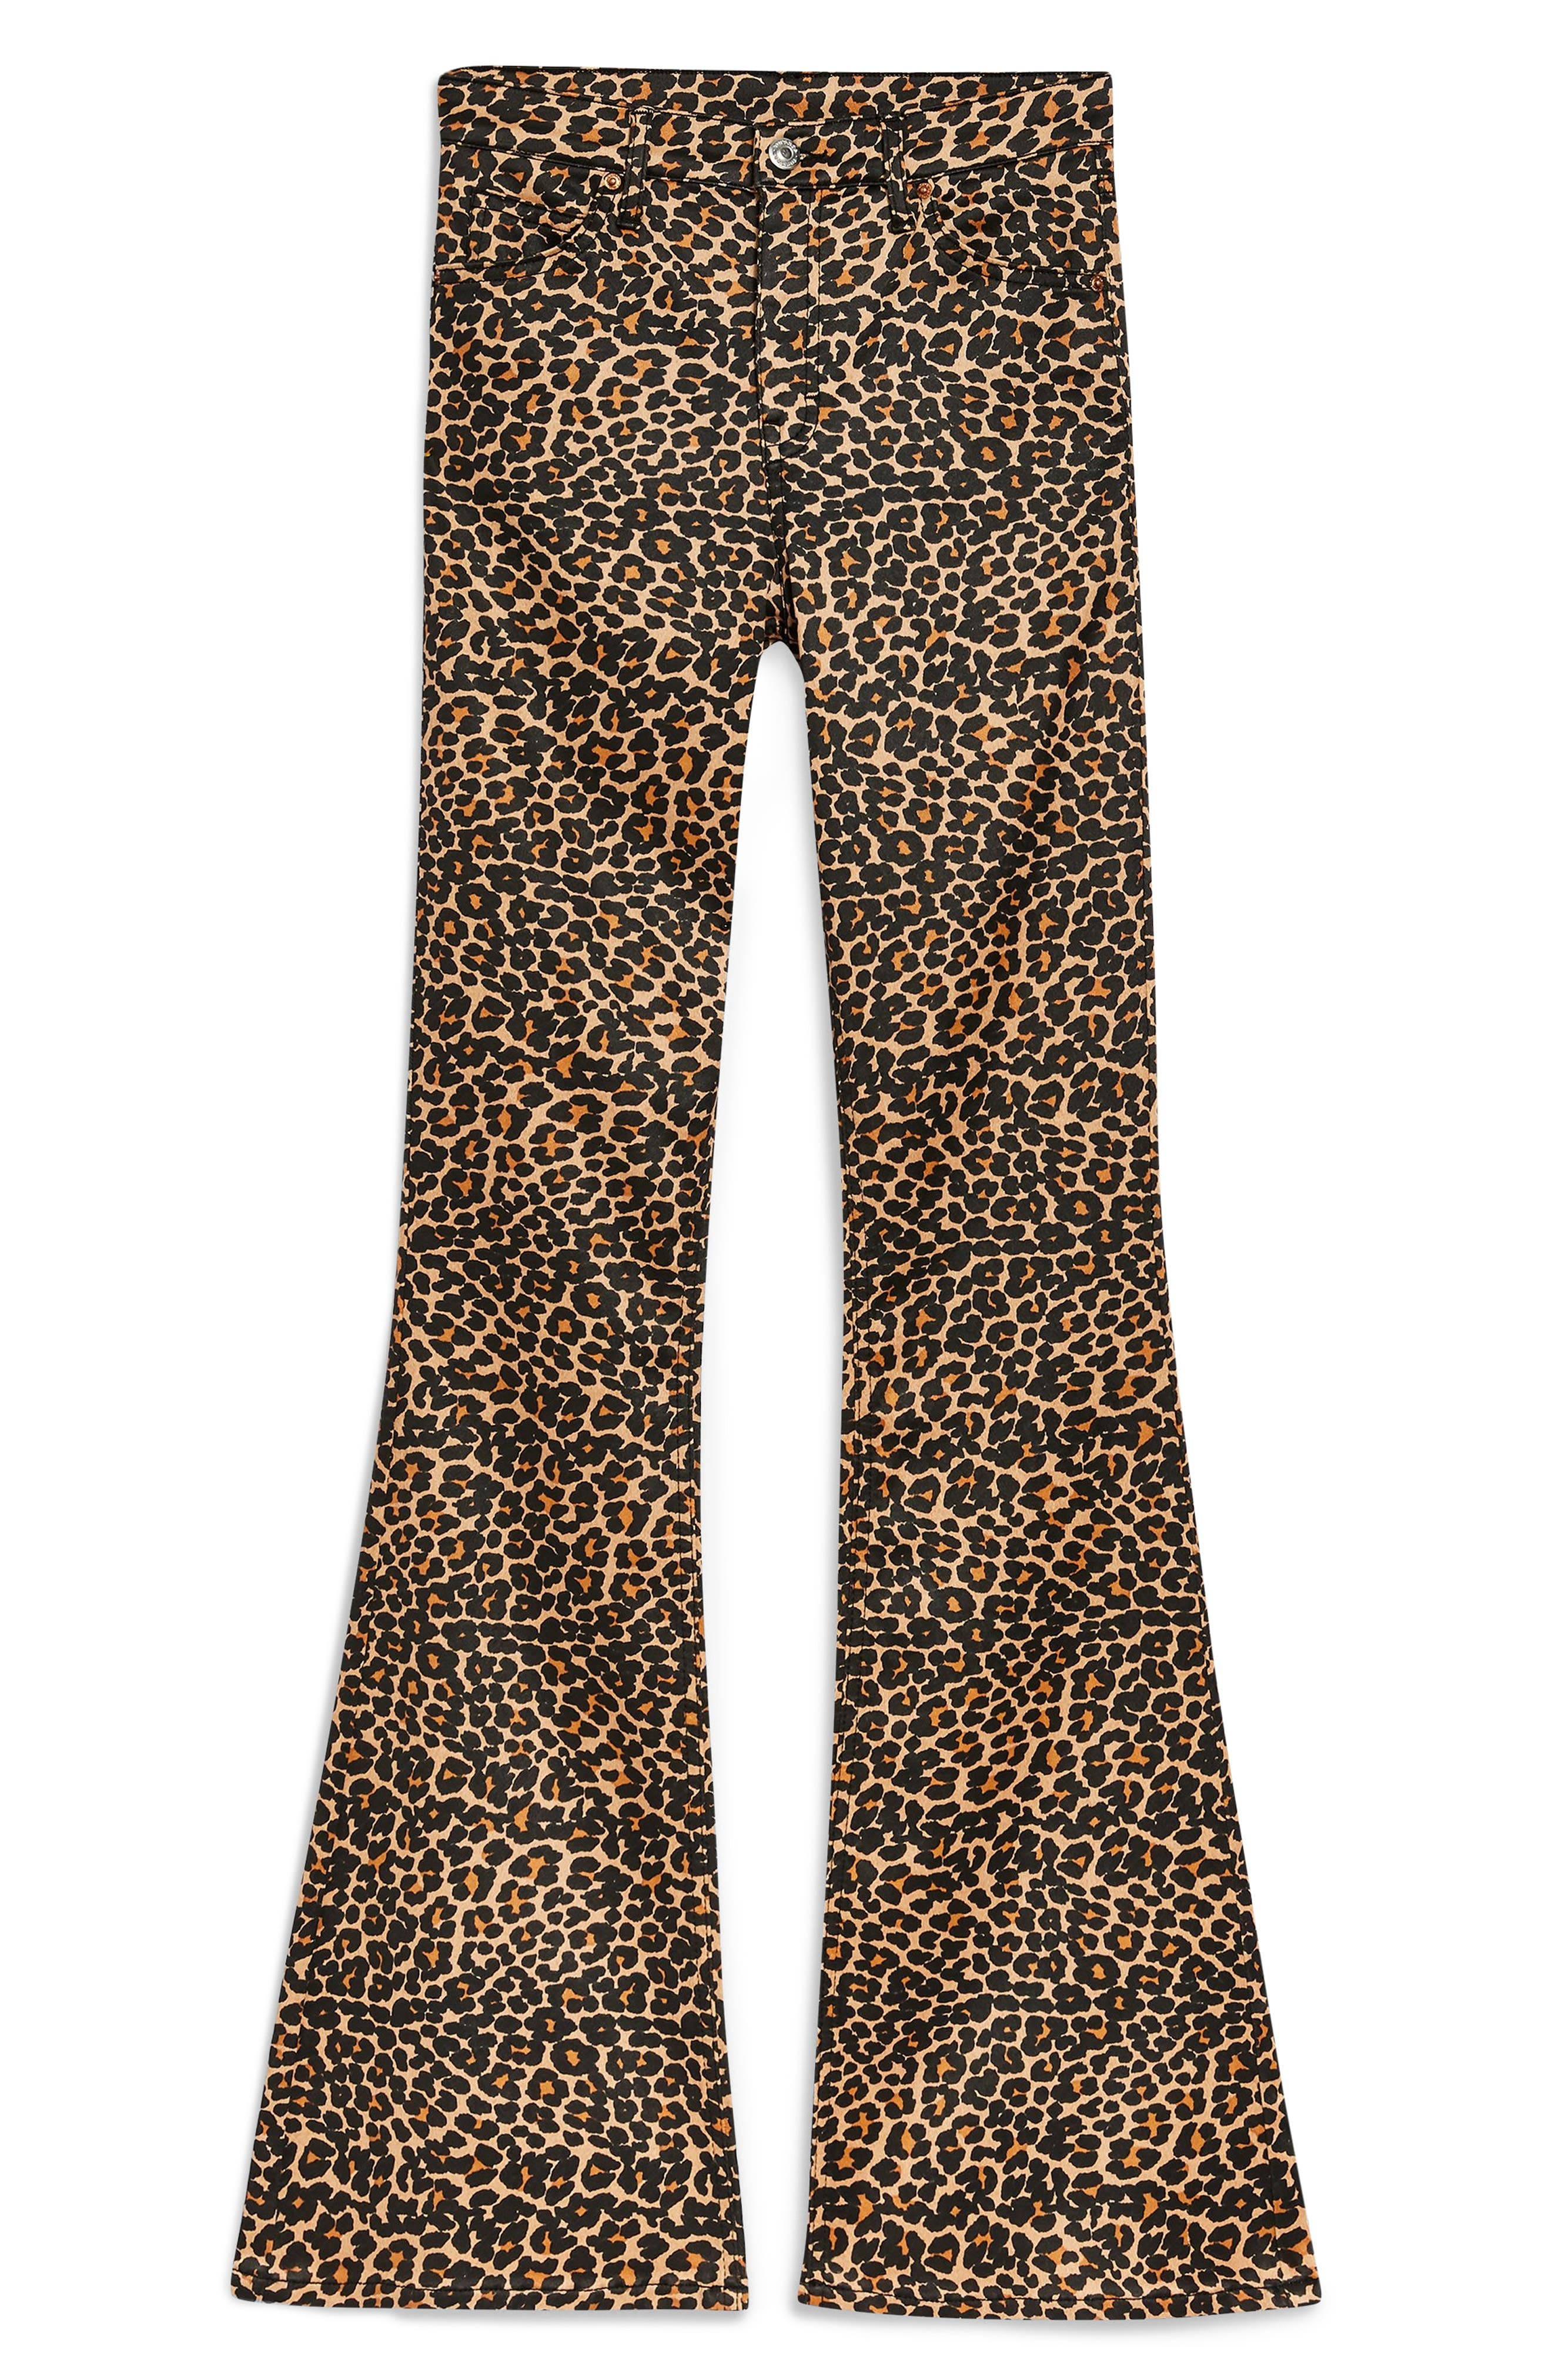 MOTO Leopard Print Flare Jeans,                             Alternate thumbnail 3, color,                             BROWN MULTI